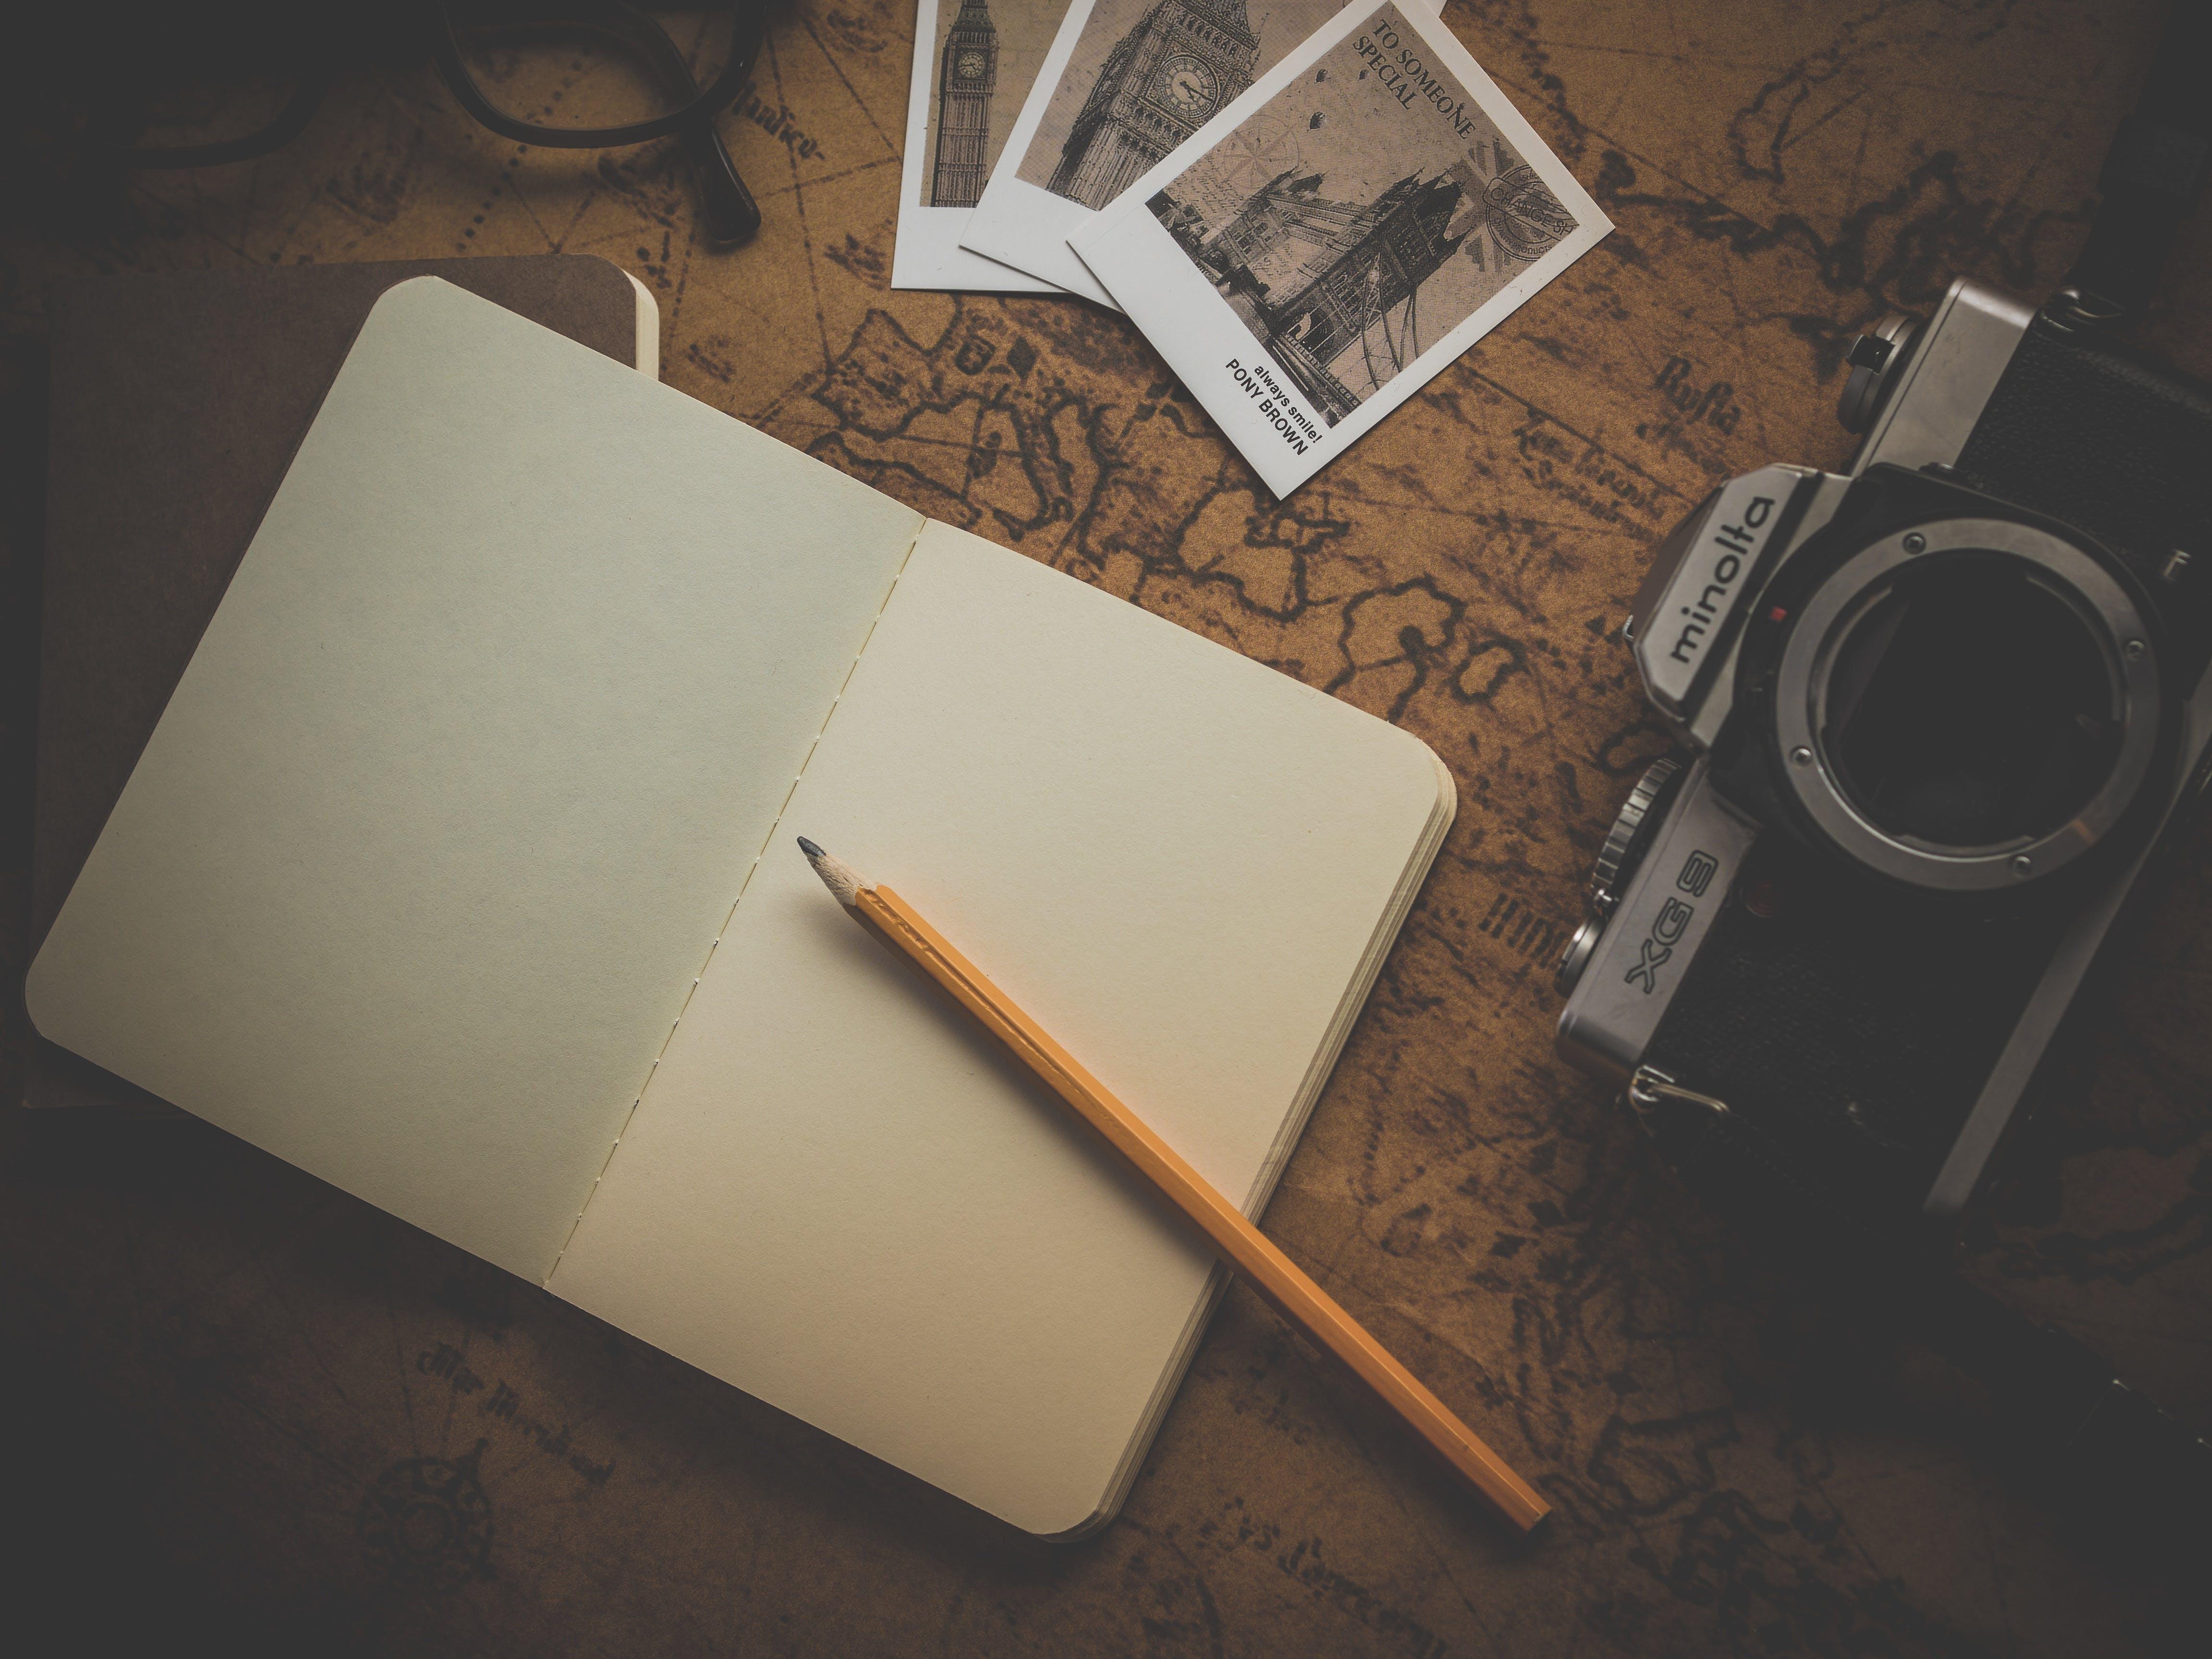 Yellow Pencil on White Book Near Camera